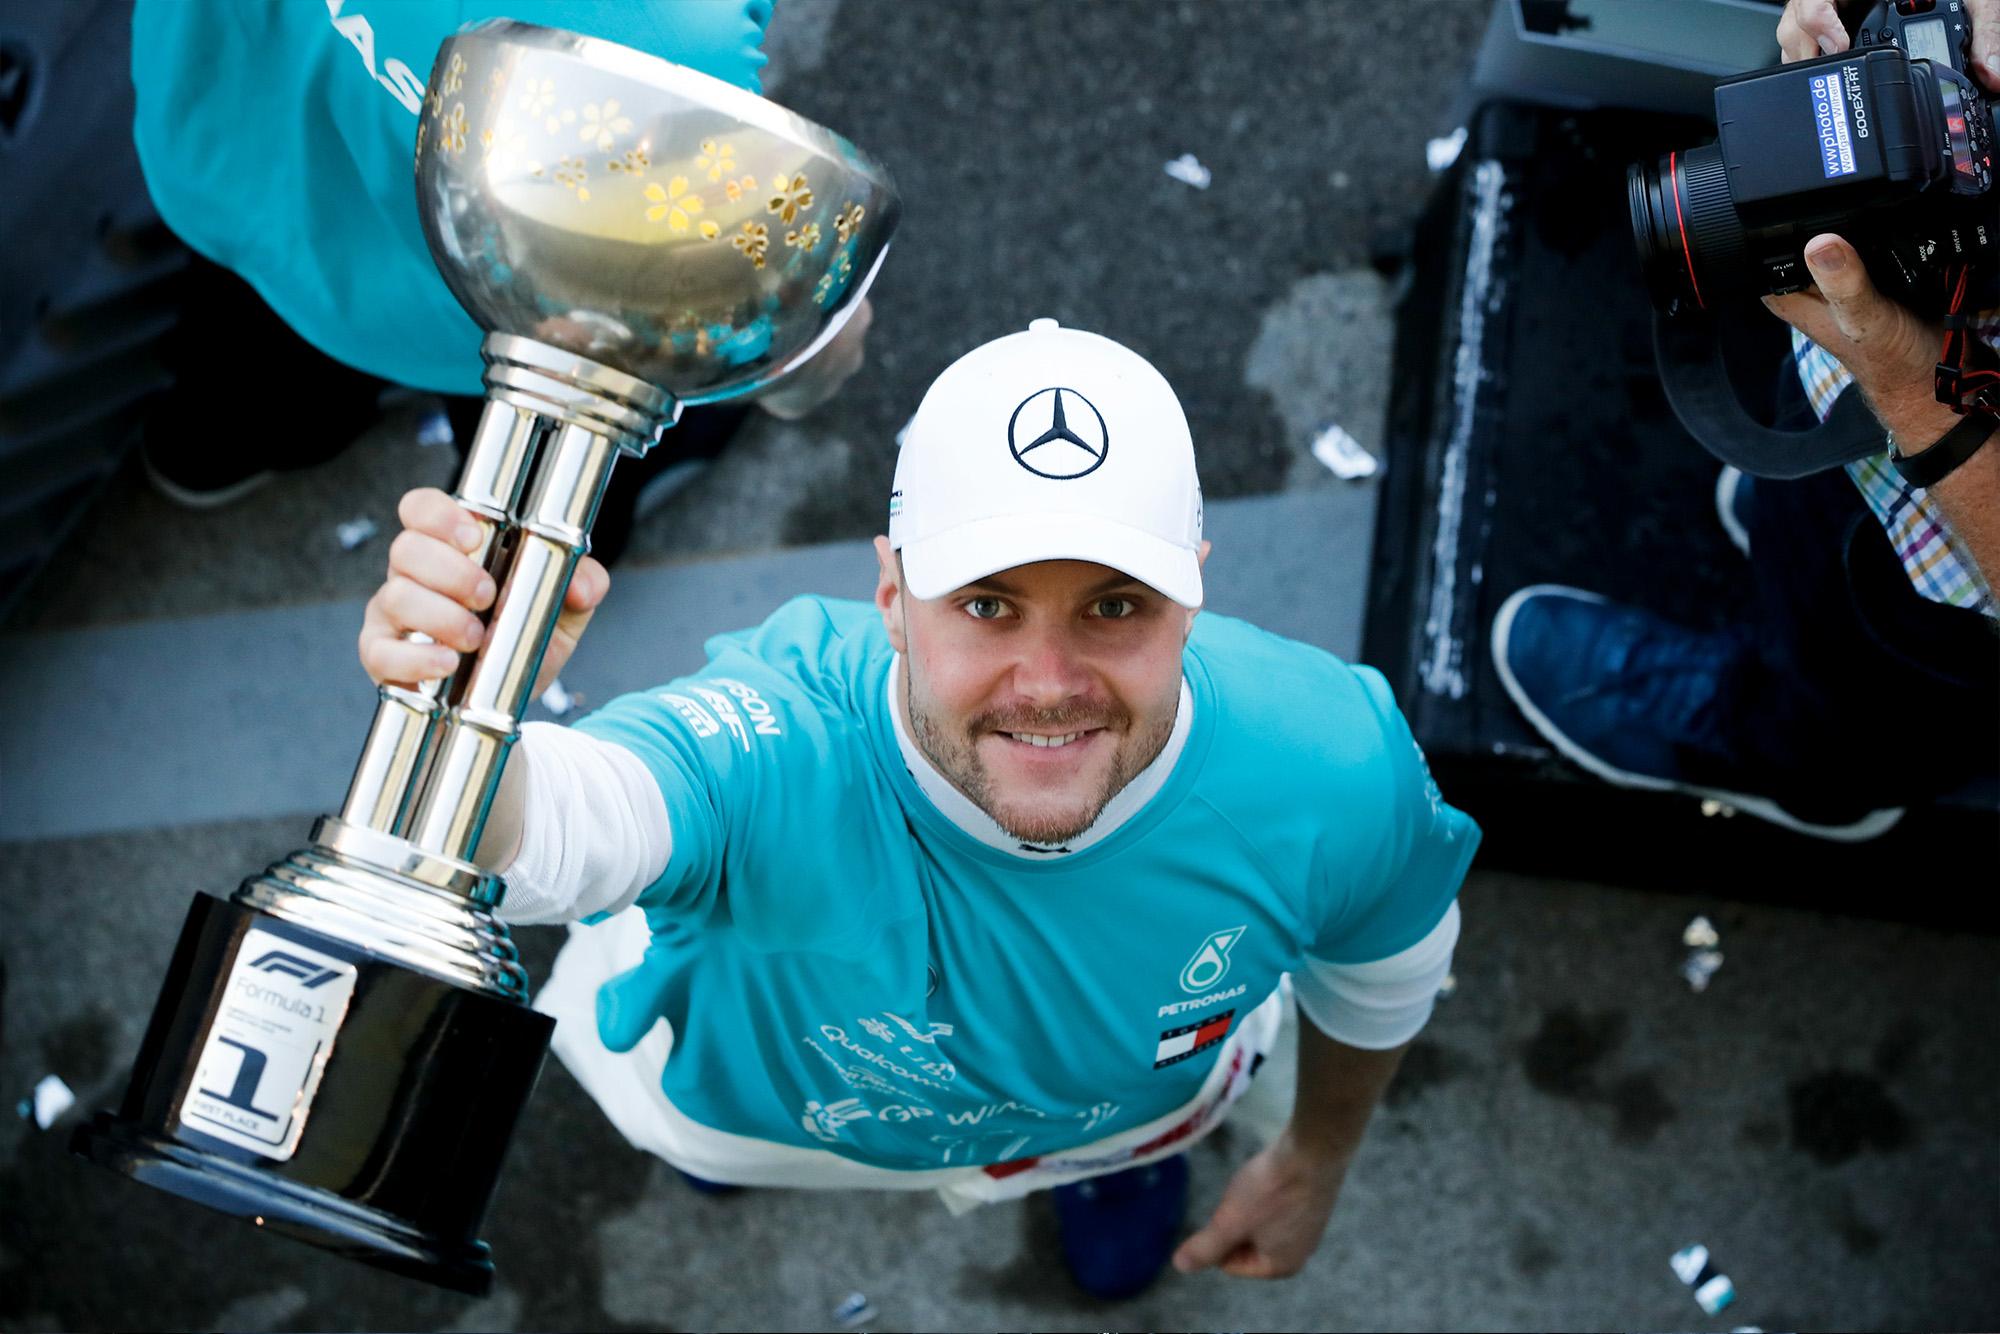 2019 Japanese Grand Prix report: Cool Bottas seals Mercedes championship